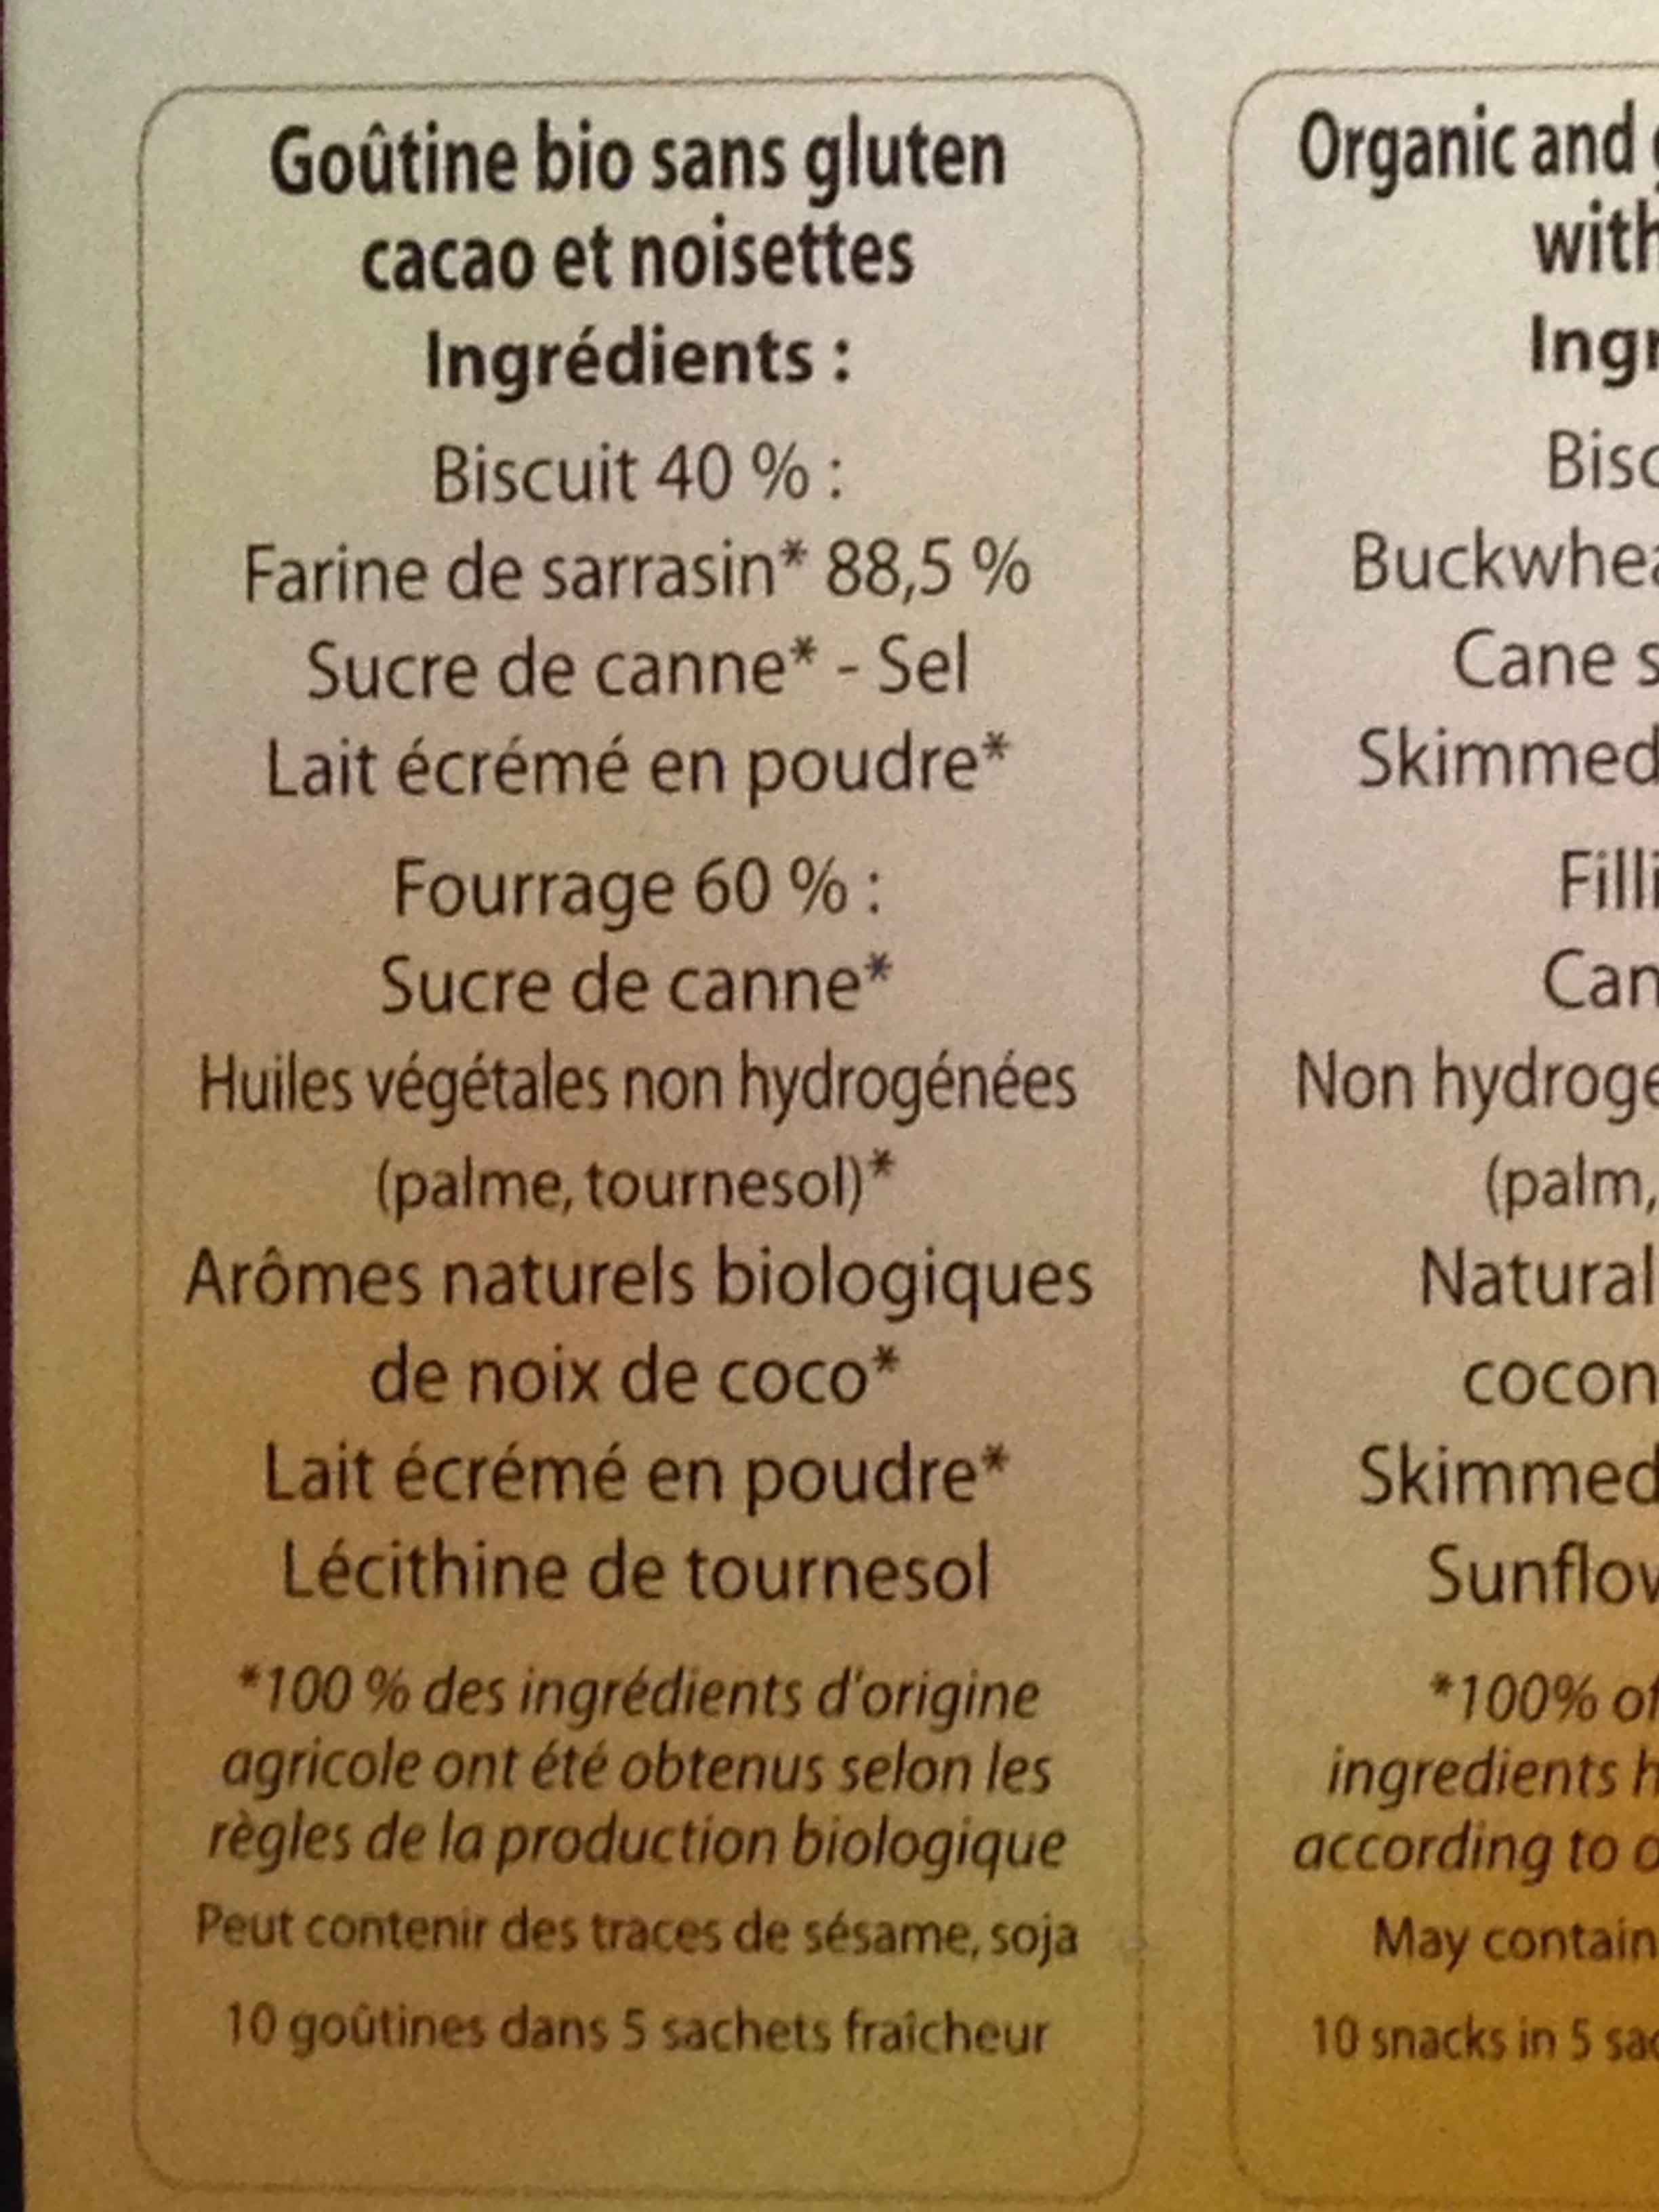 Goutine Noix de coco - Ingredients - fr